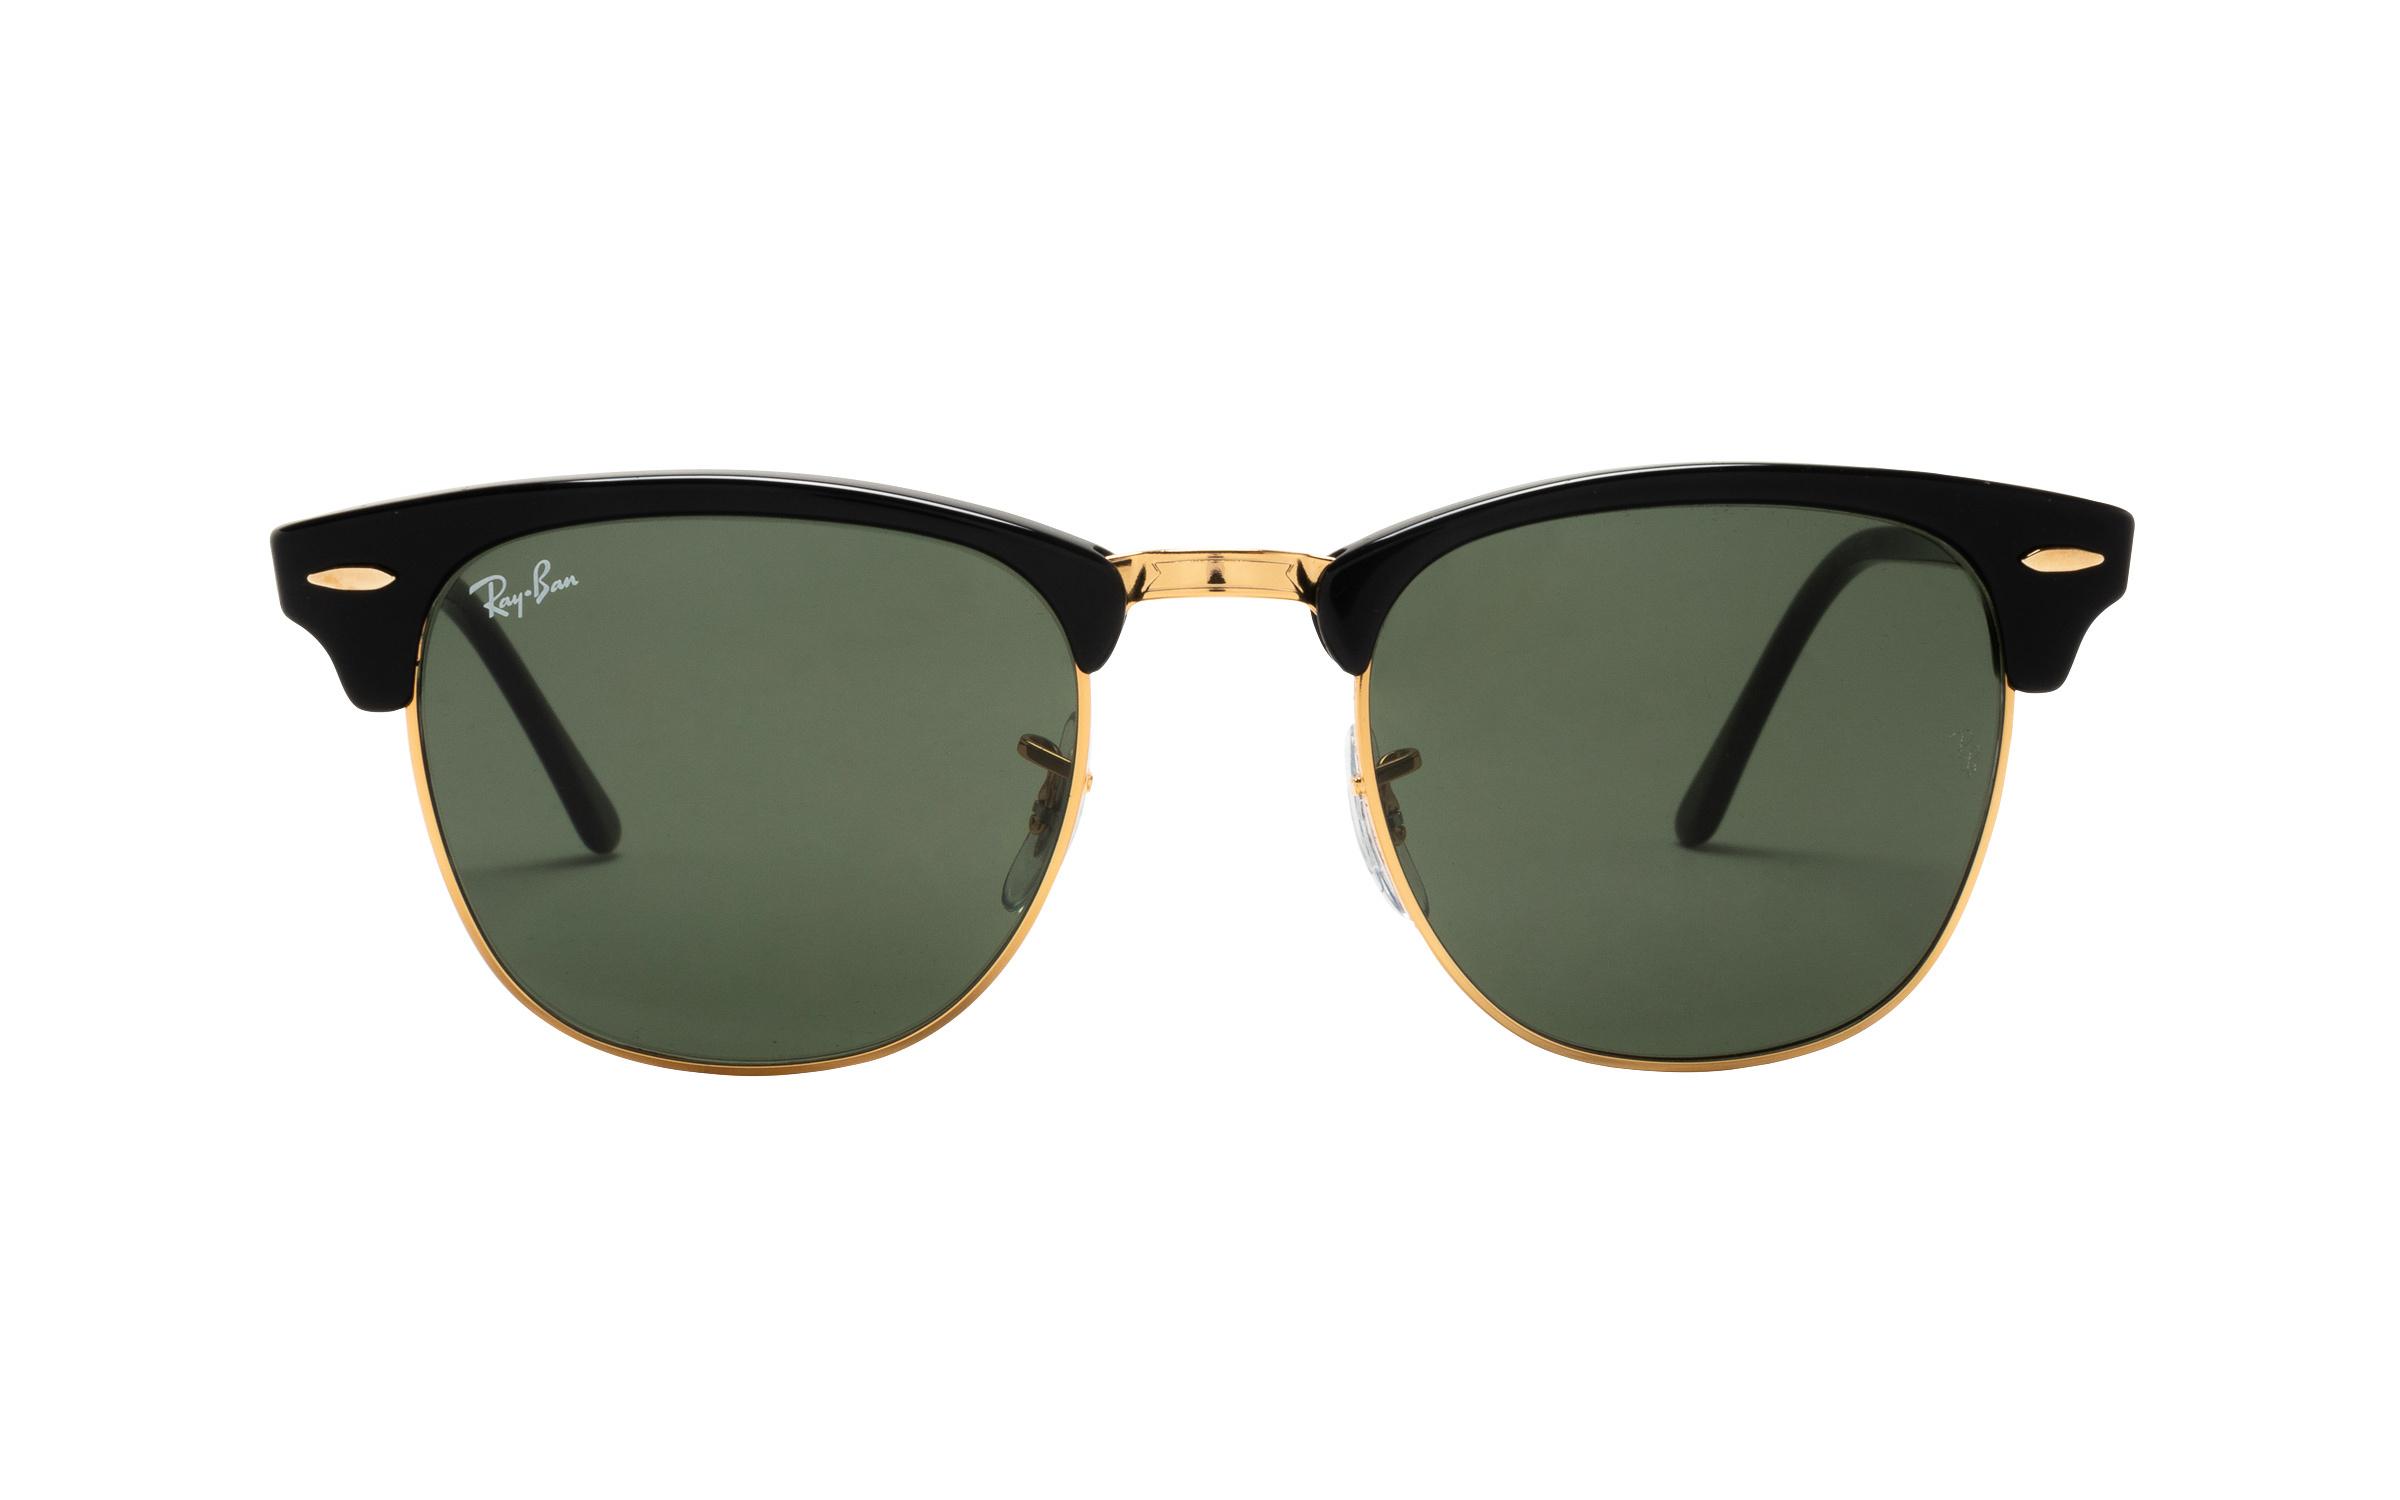 coastal.com - RayBan Ray-Ban RB3016 W0365 Ebony/ Arista 51 Sunglasses in Black – Online Coastal 154.00 USD